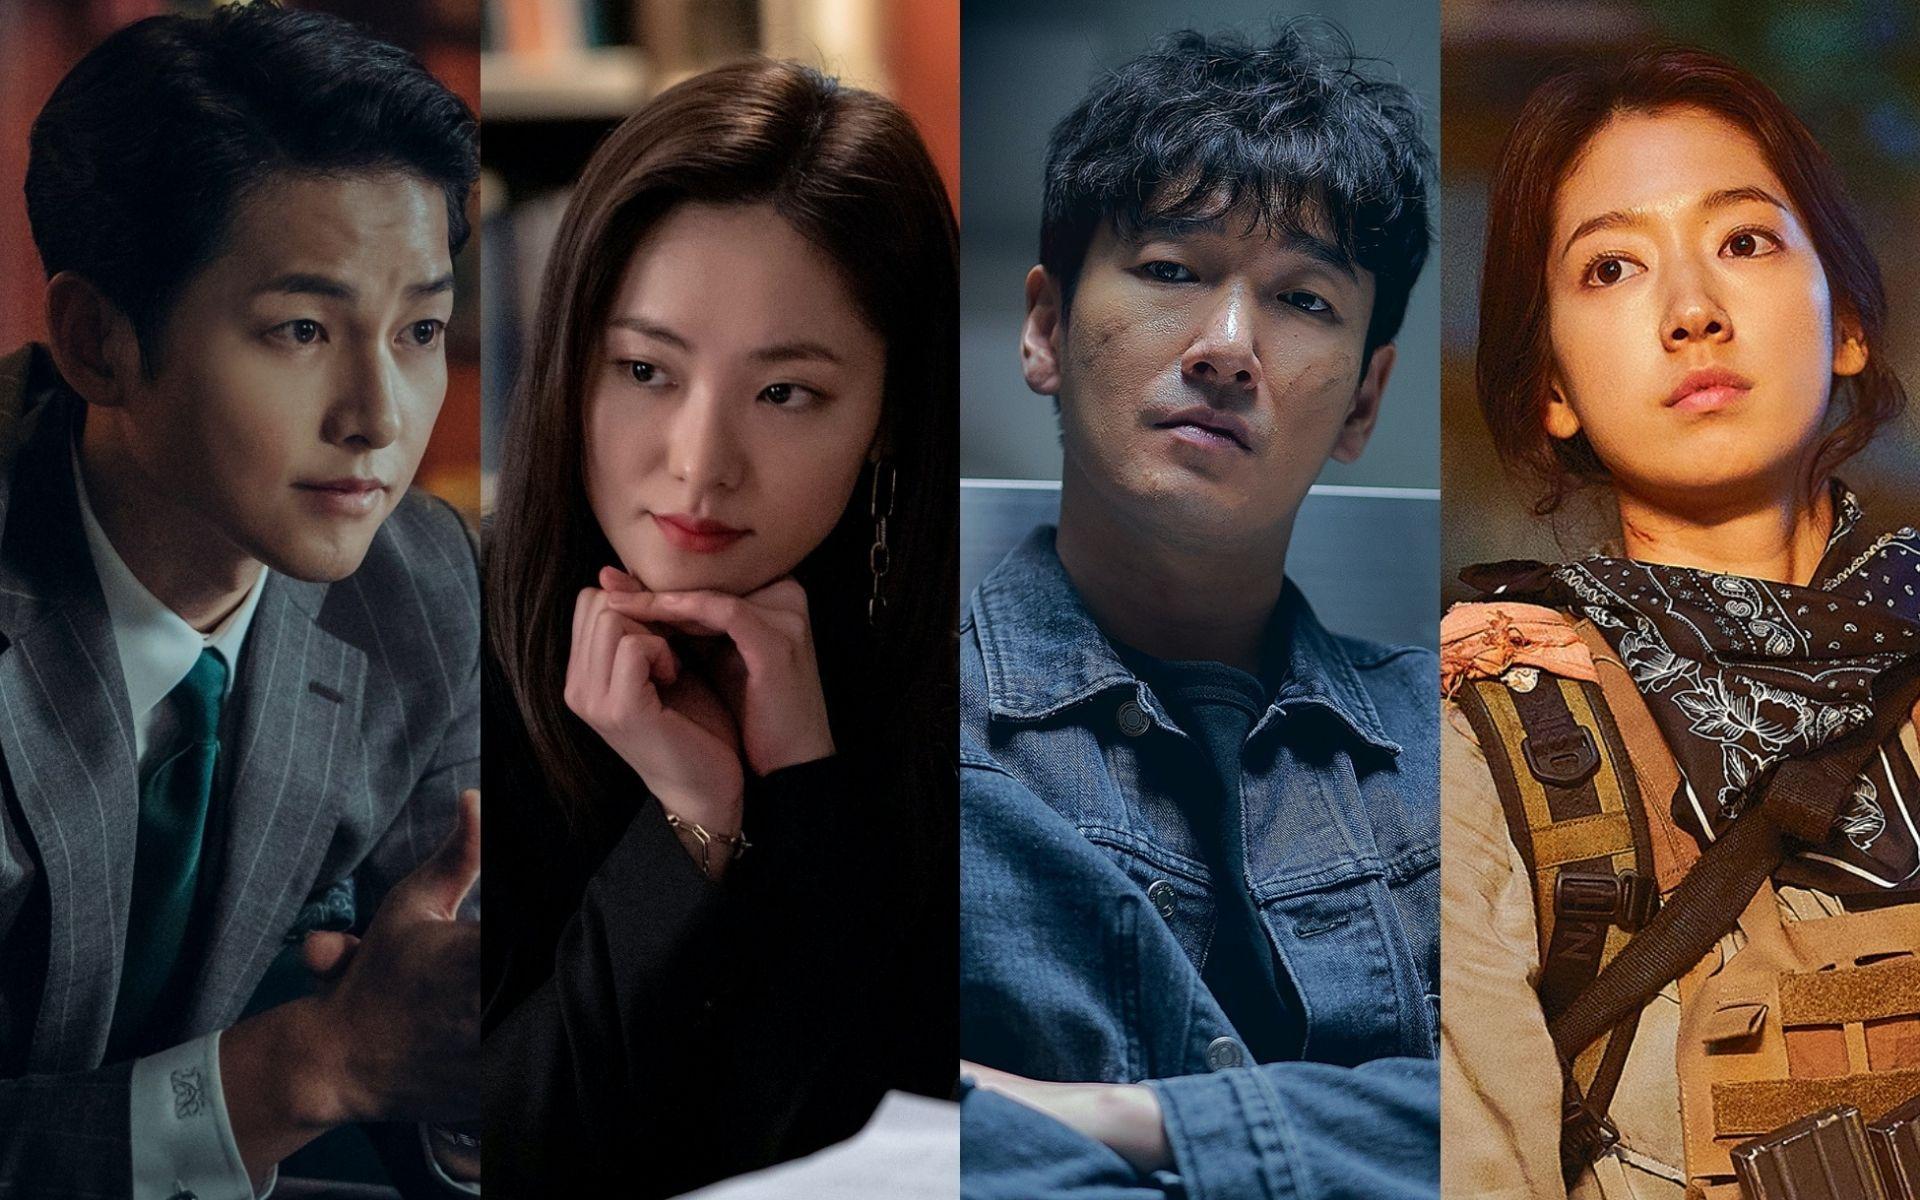 Song Joong-ki, Jeon Yeo-been, Cho Seung-woo and Park Shin-hye